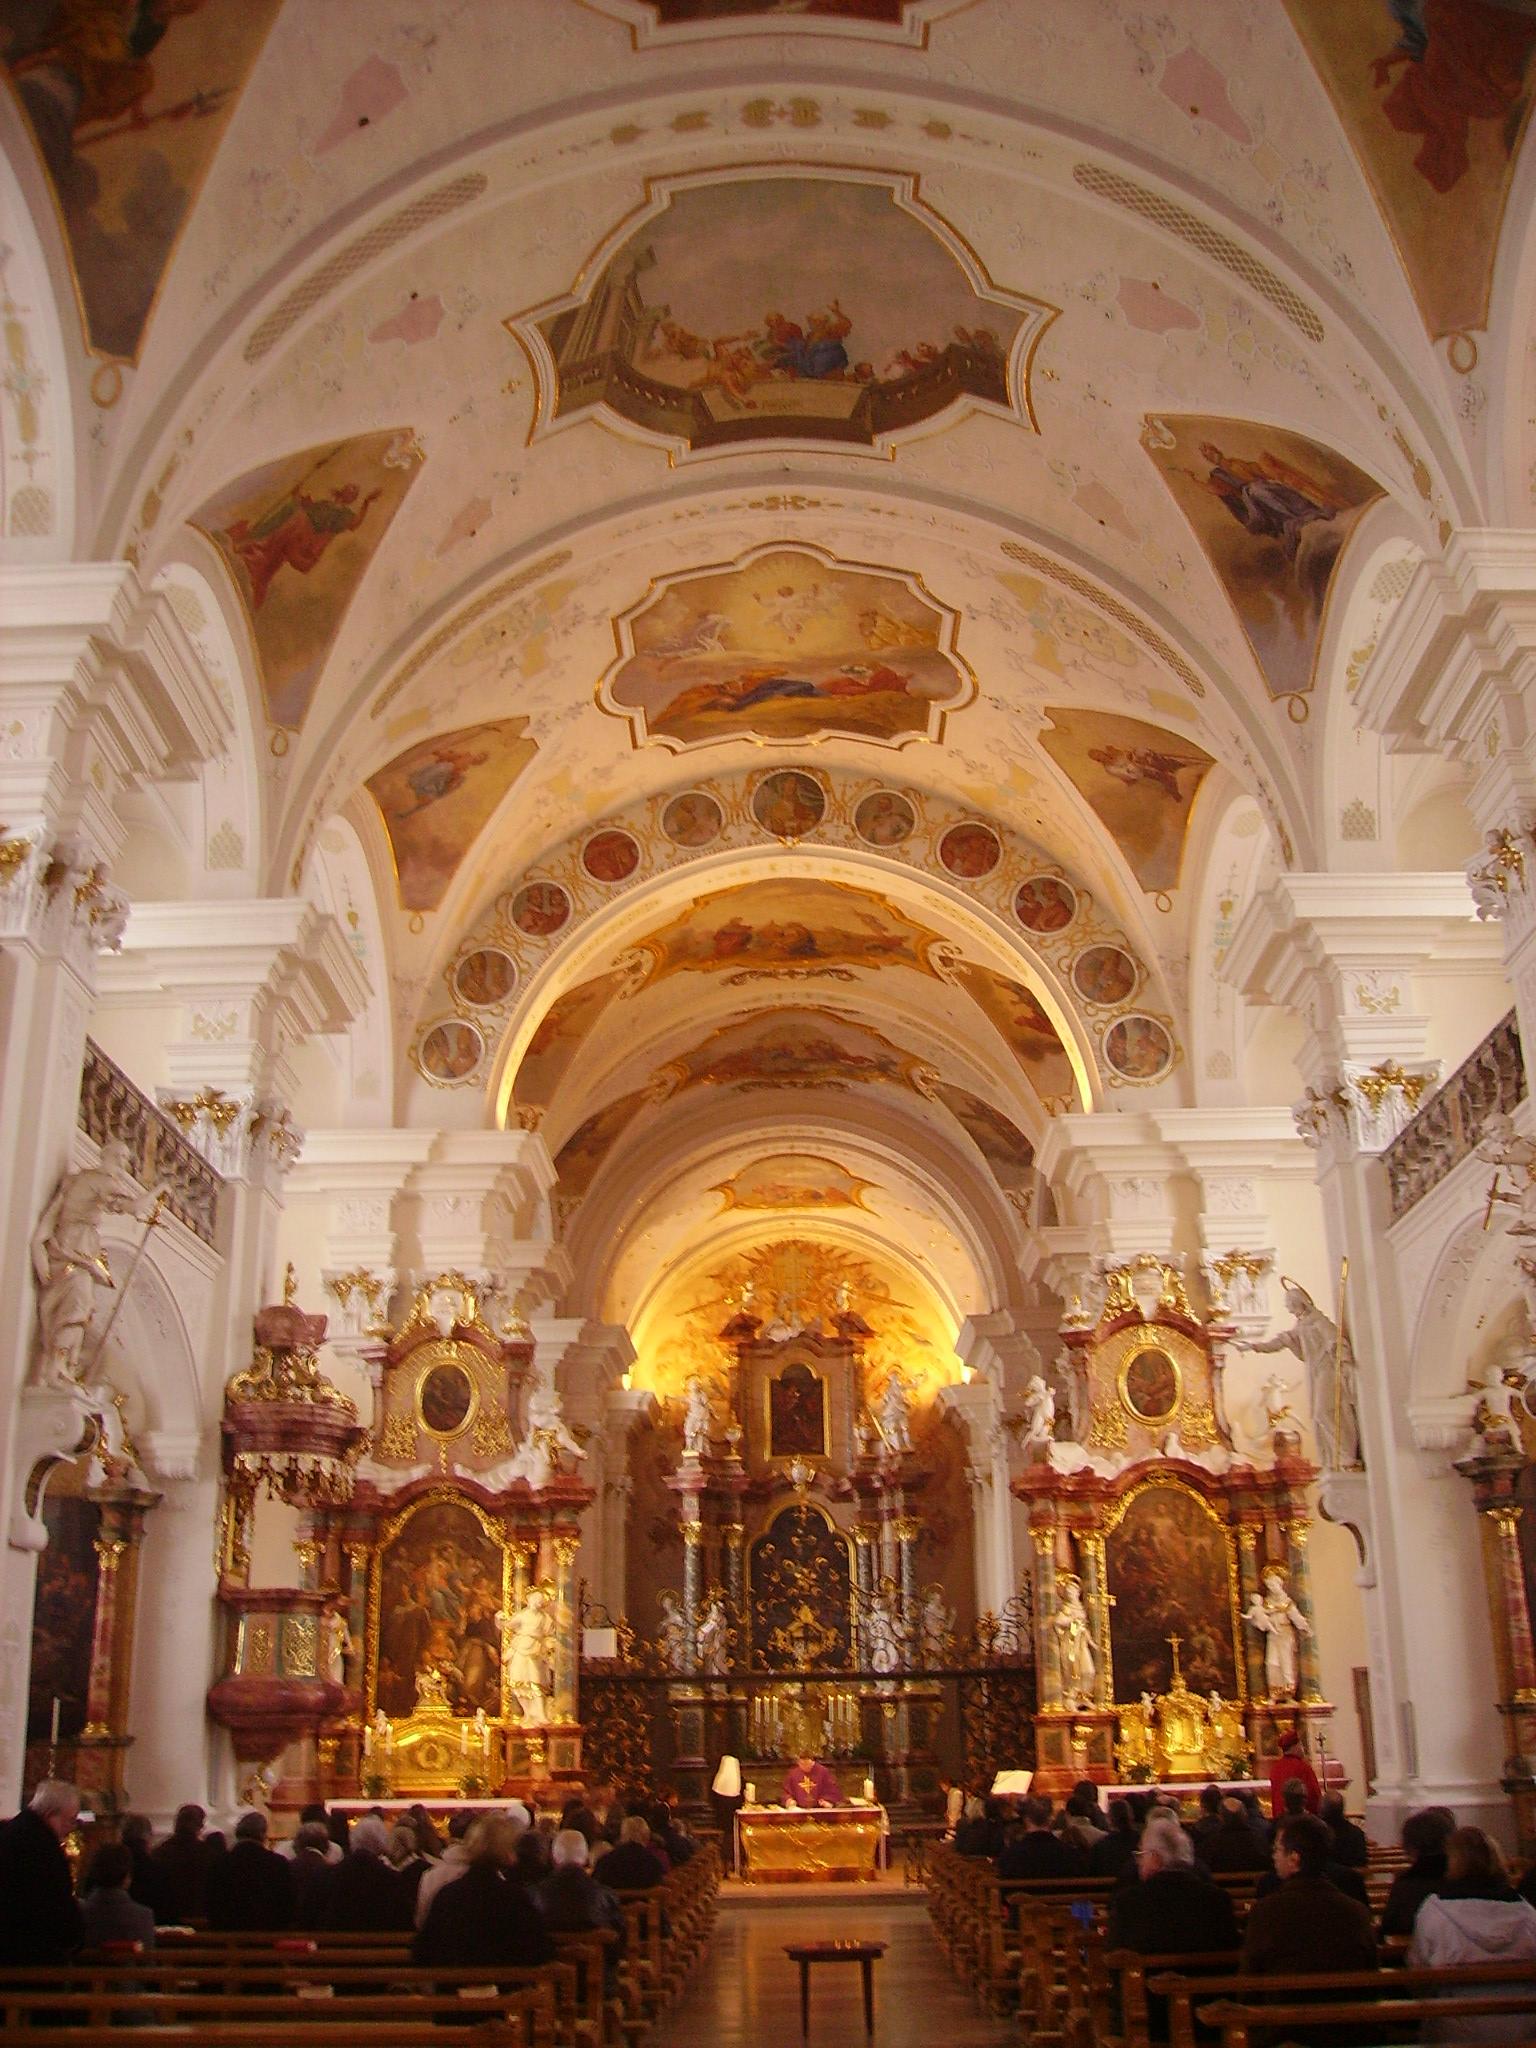 Sankt Peters klosters kyrka Instagram posts - satisfaction-survey.net